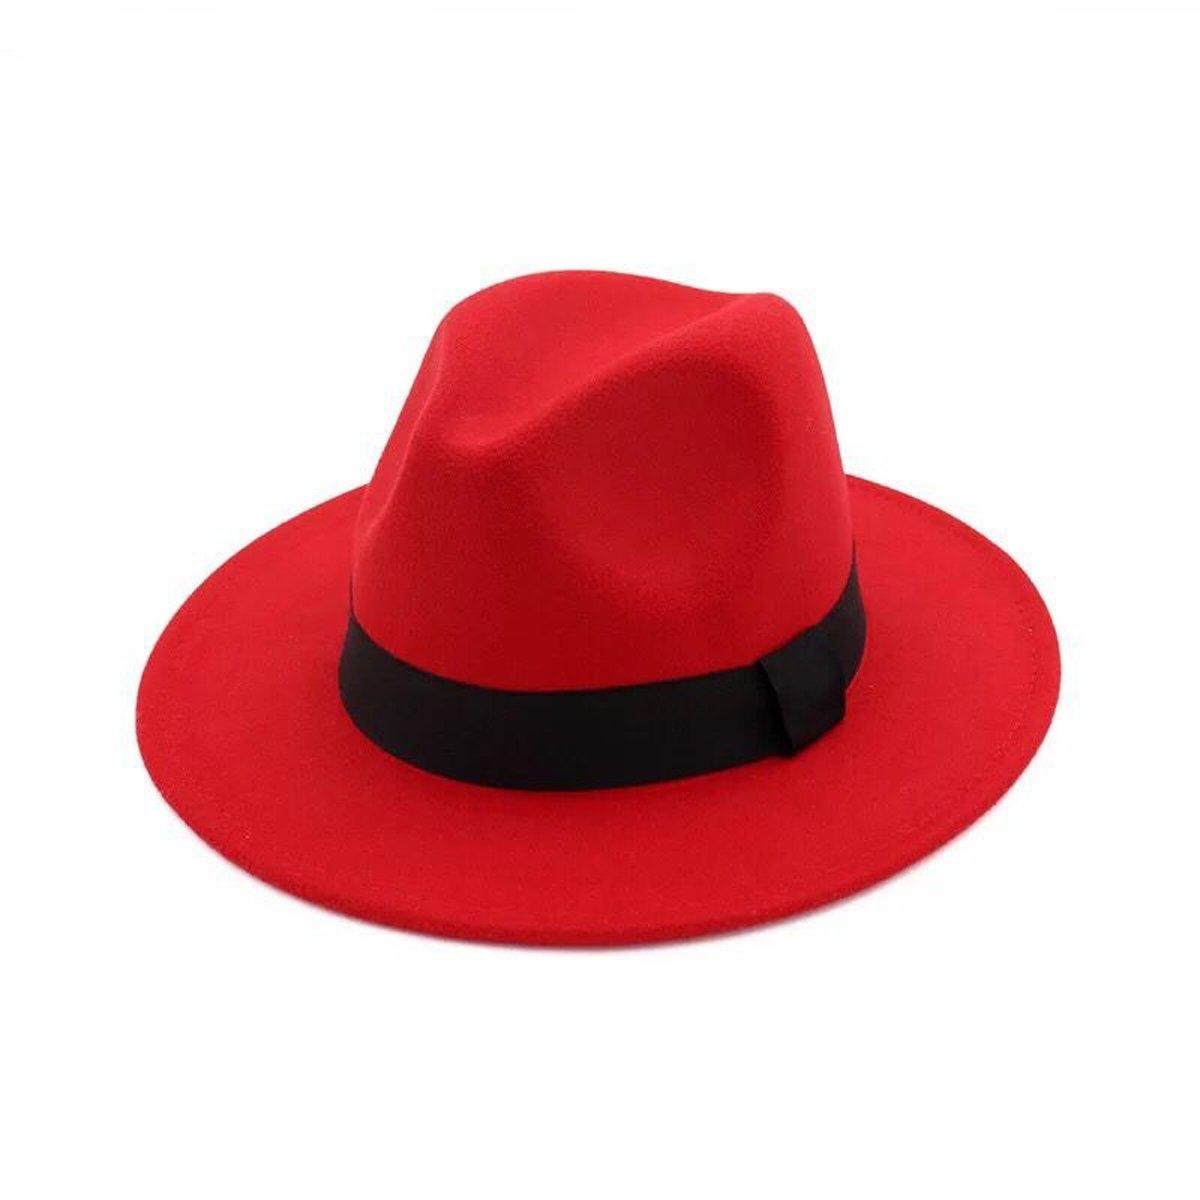 Lanzom Women Wide Brim Straw Wool Fedora Hat Retro Style Belt Panama Hat (Red, One Size) by Lanzom